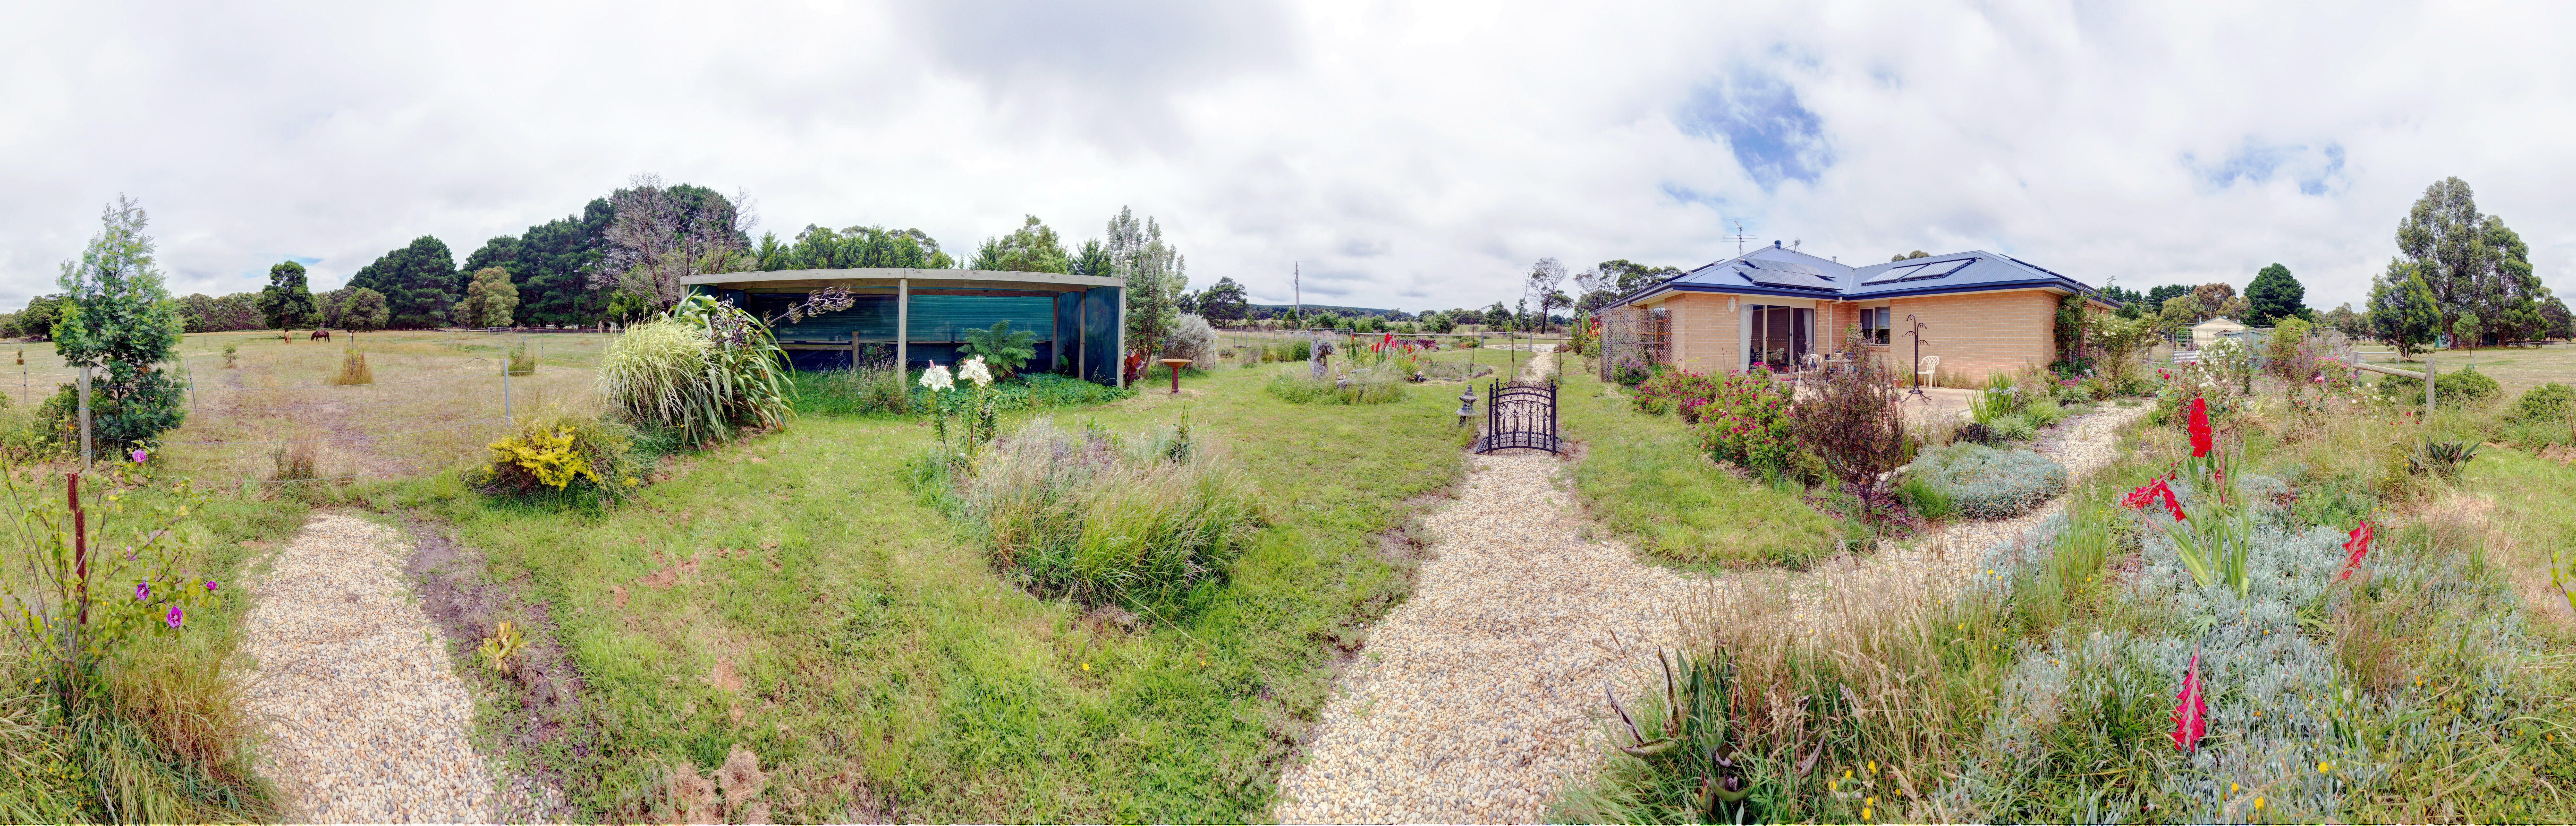 garden-nw.jpeg